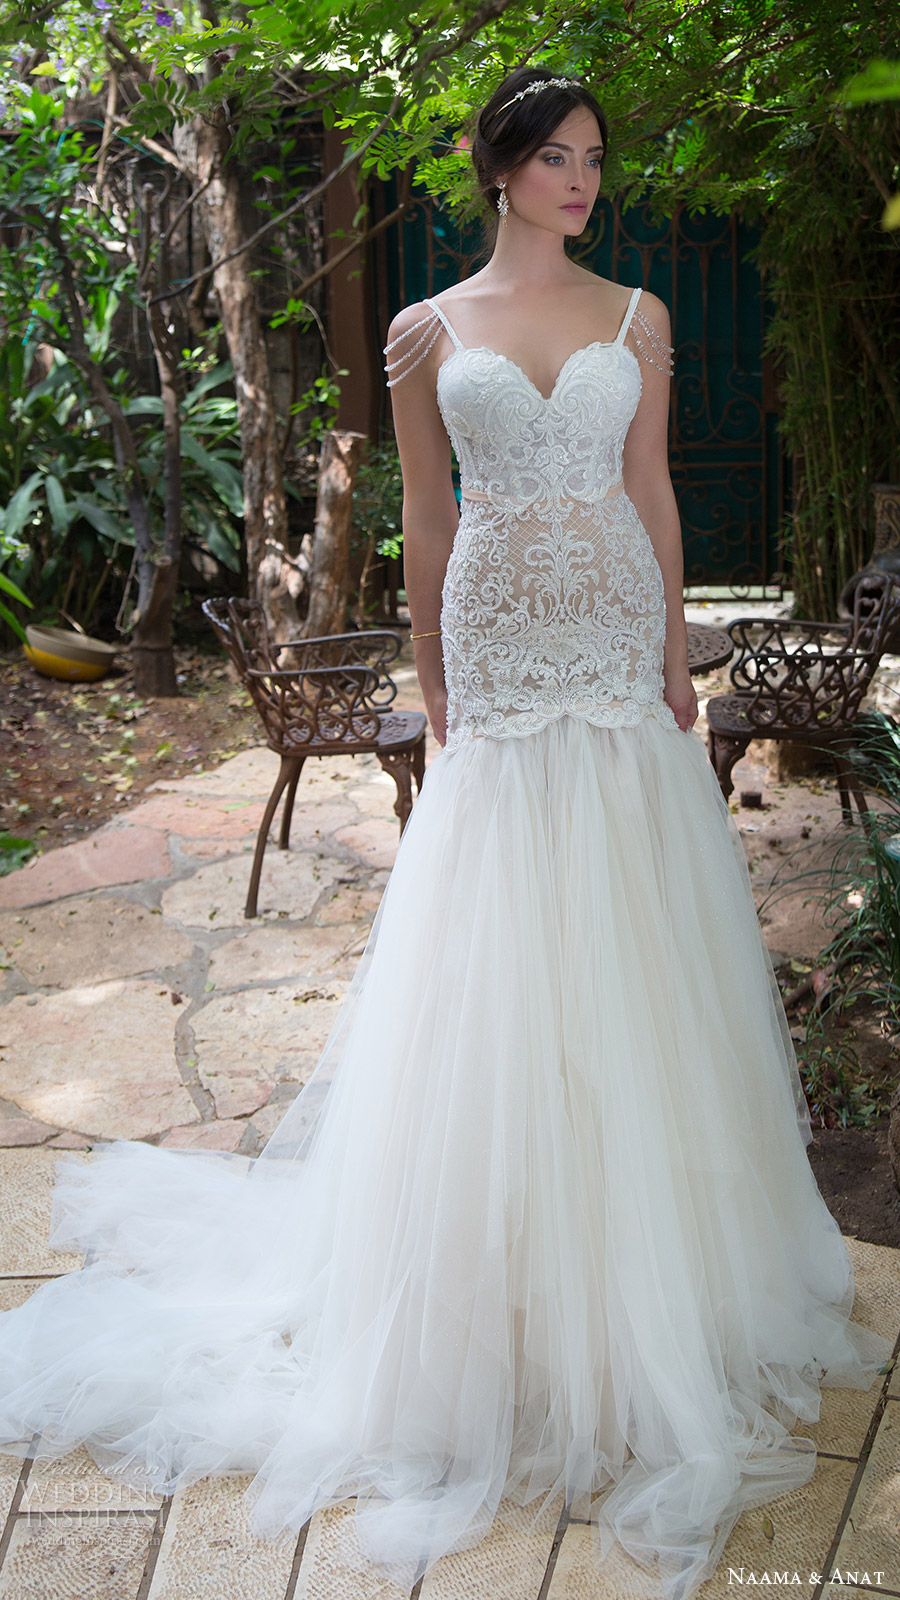 120adc1690d5 Naama Anat 2017 Wedding Dresses Primavera Bridal